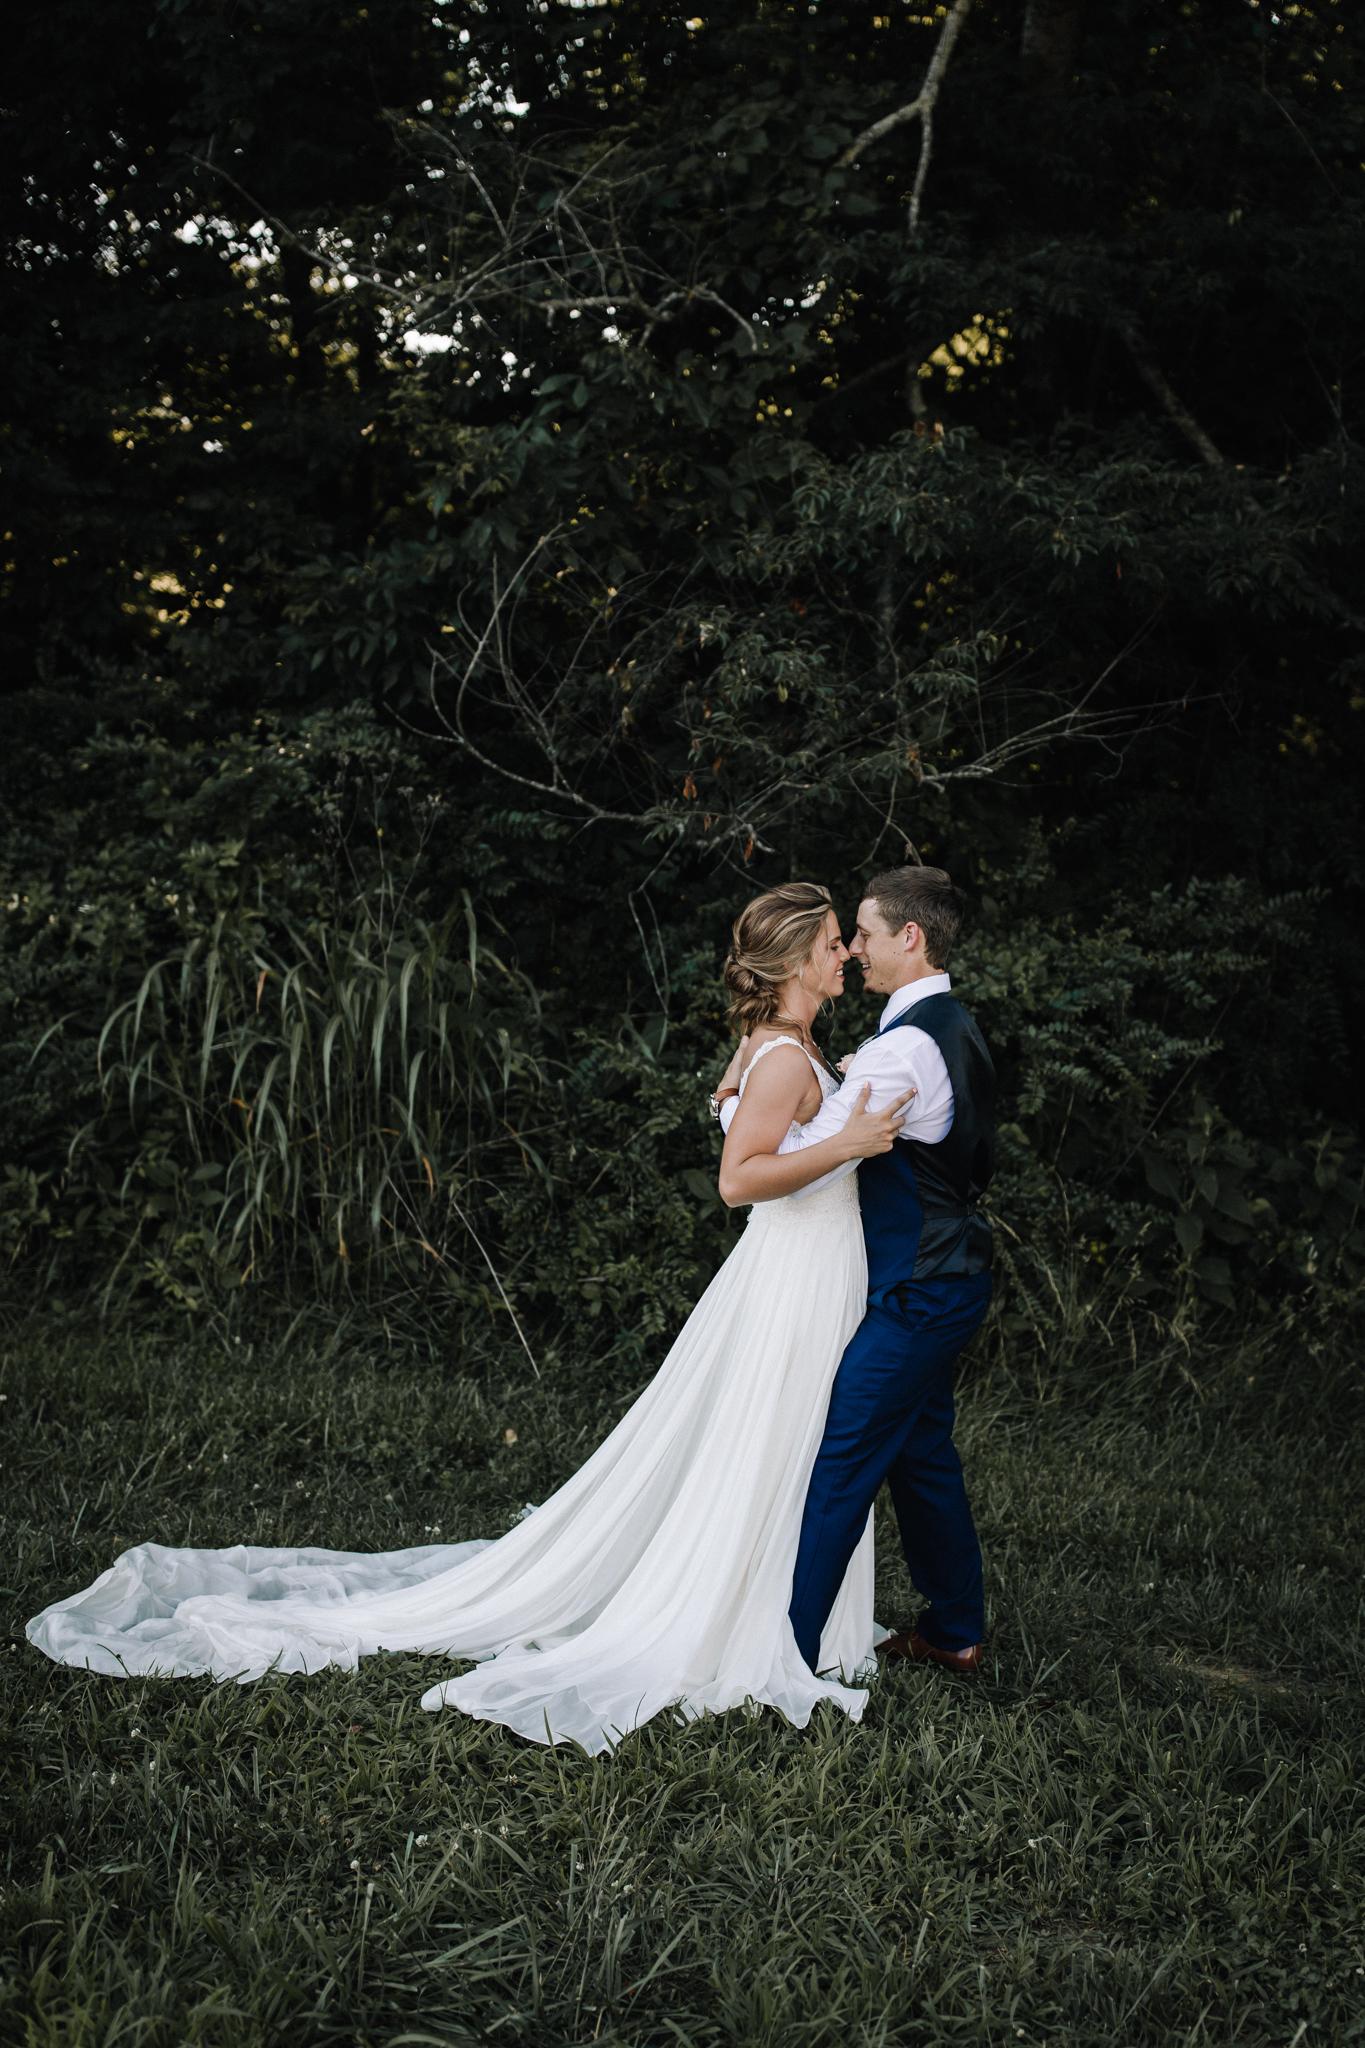 billie-shaye style photography - www.billieshayestyle.com - elkins grove wedding venue - modern classy summer outdoor wedding - bowling green kentucky-2442.jpg